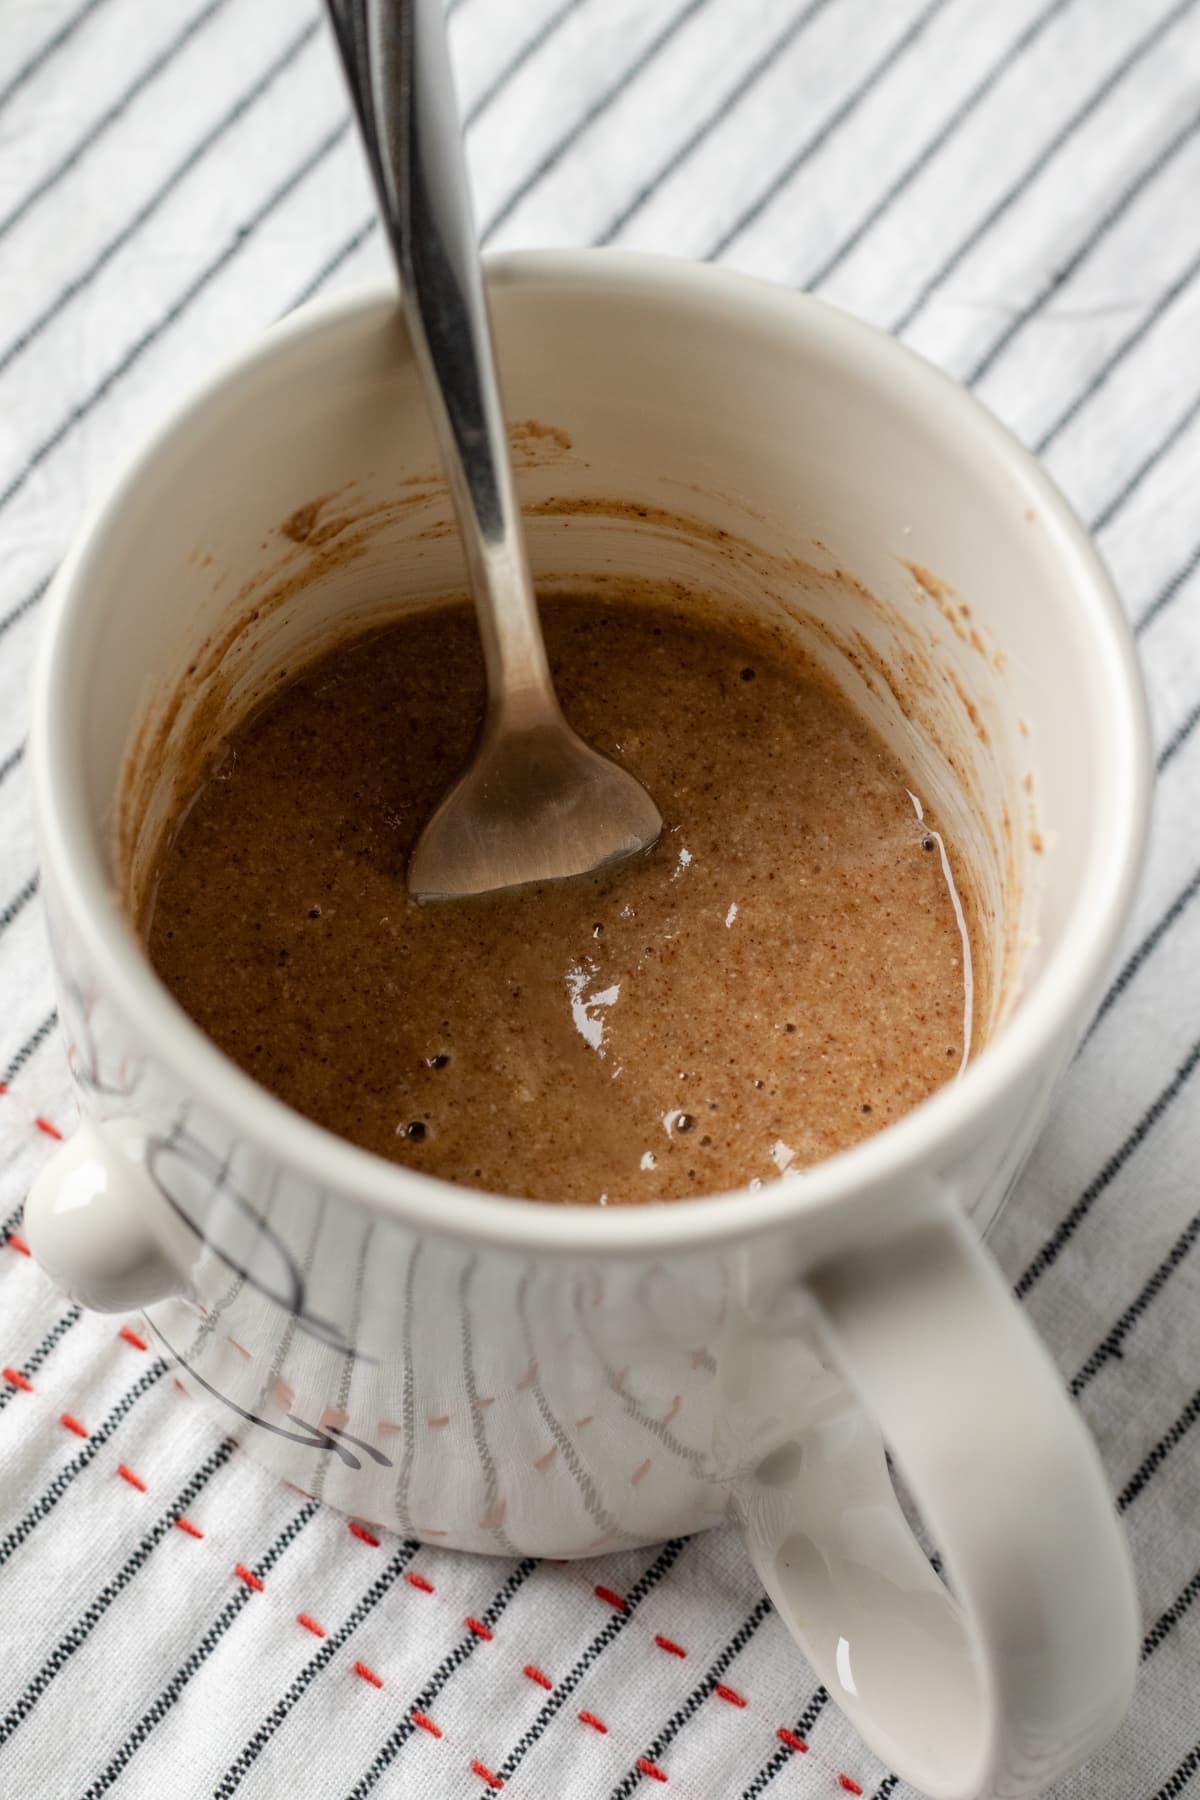 stirring together wet ingredients in a mug